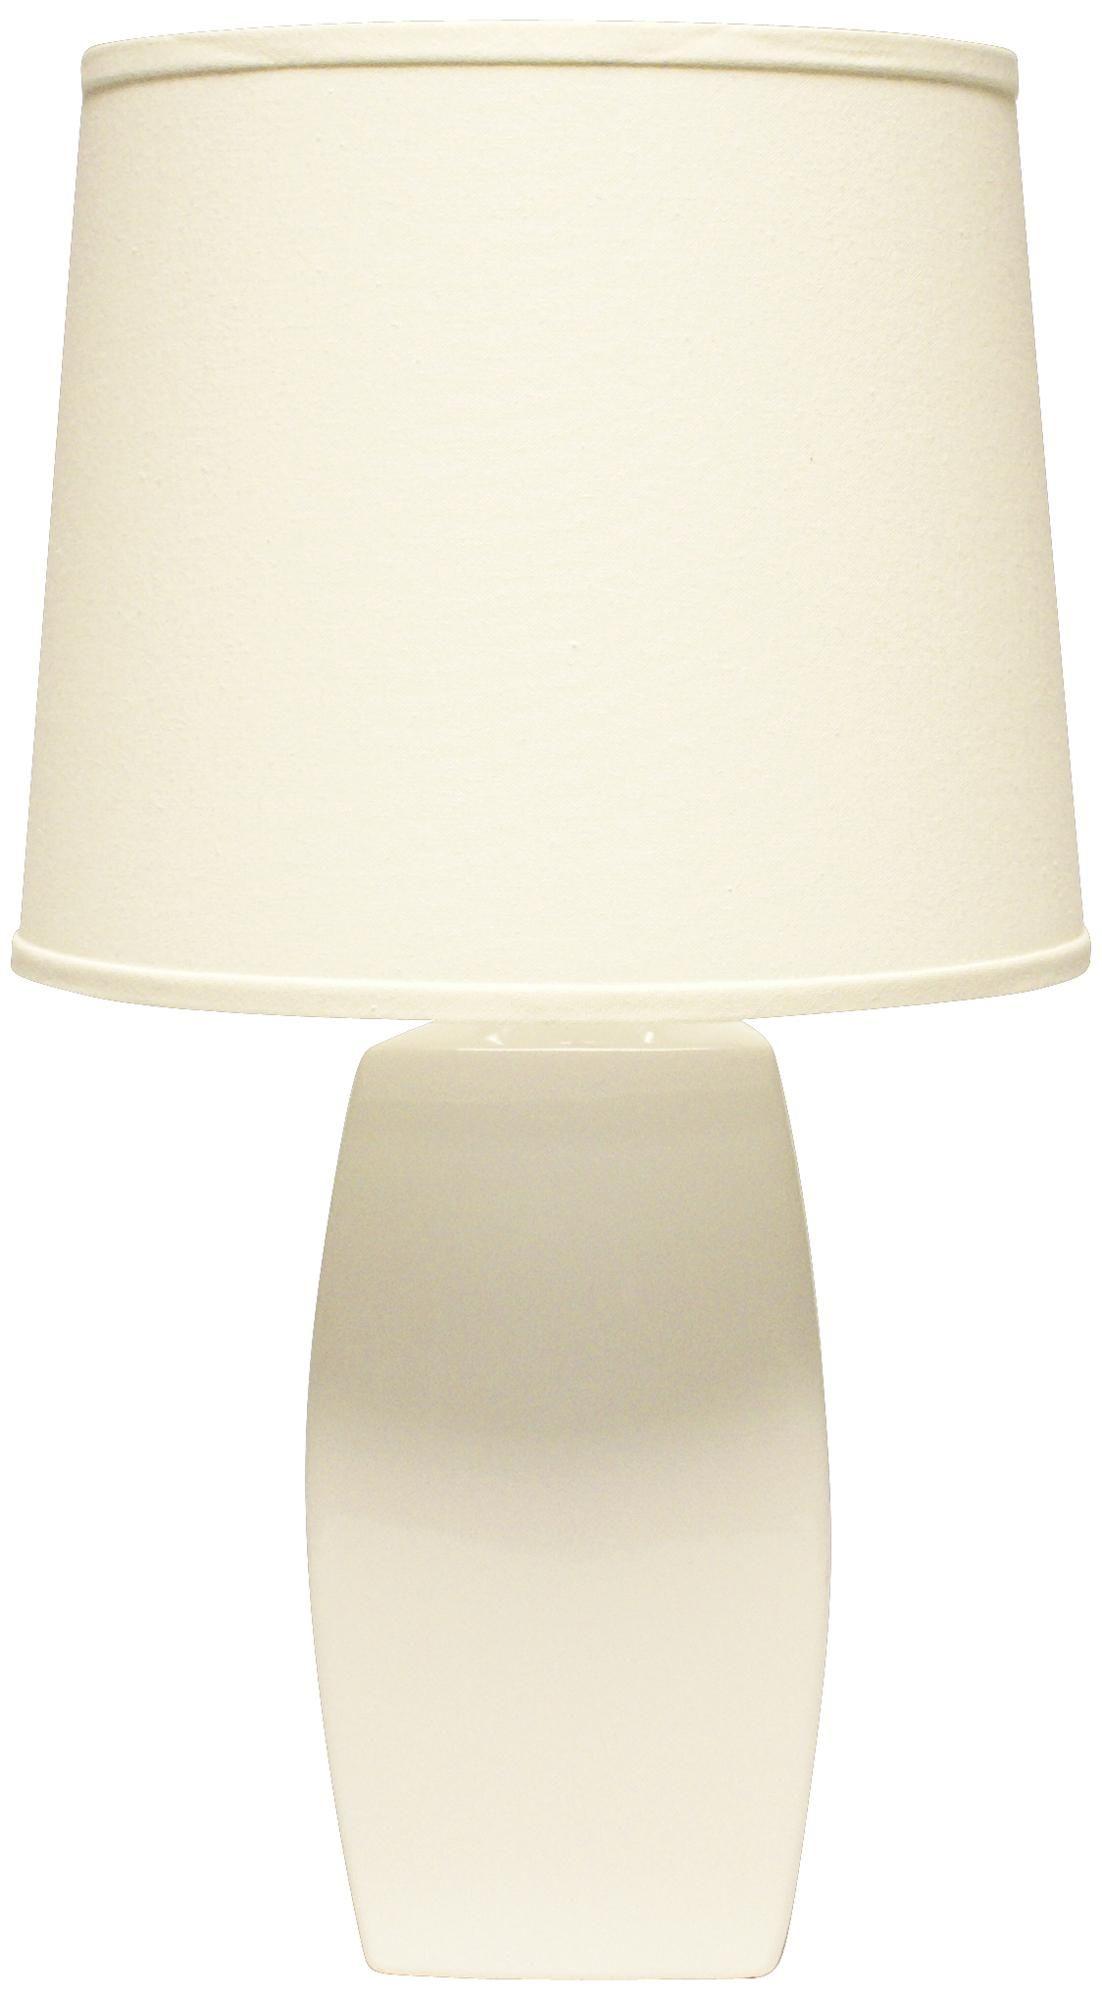 Haeger Potteries White Ceramic Soft Rectangle Table Lamp Table Lamp Rectangle Table White Ceramics